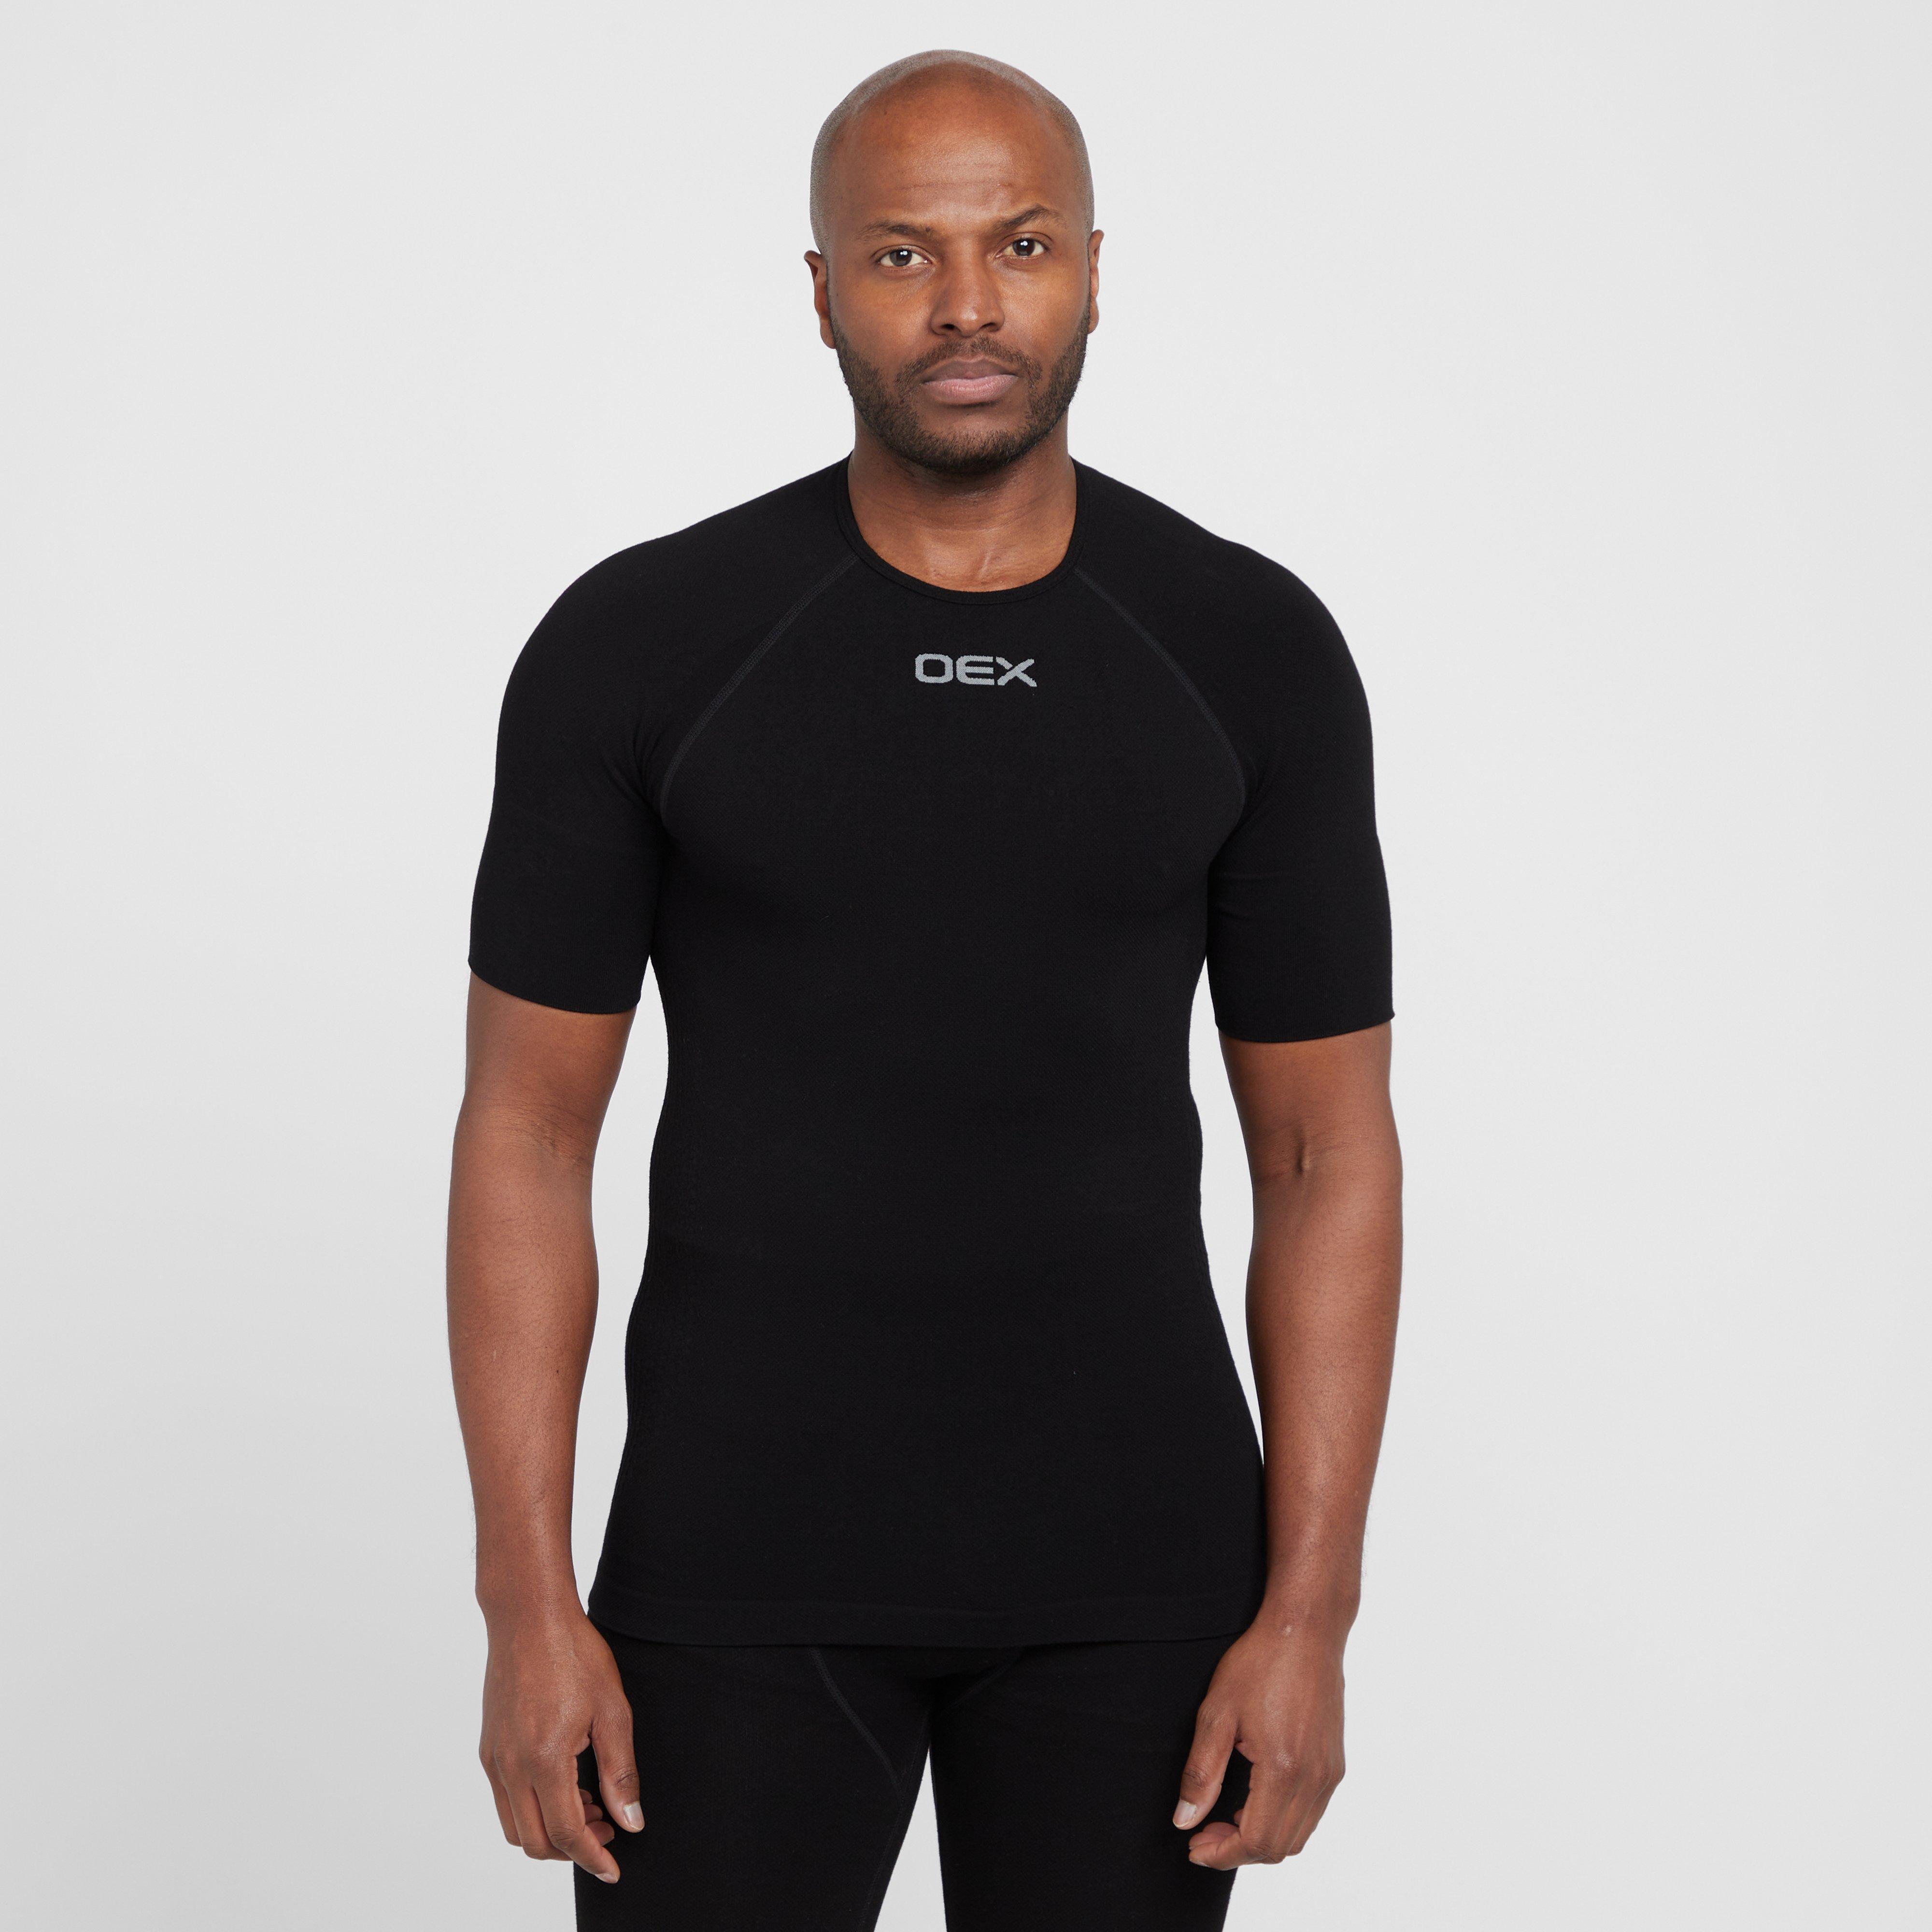 Oex Oex Mens Barneo Short Sleeve Baselayer Top, Black